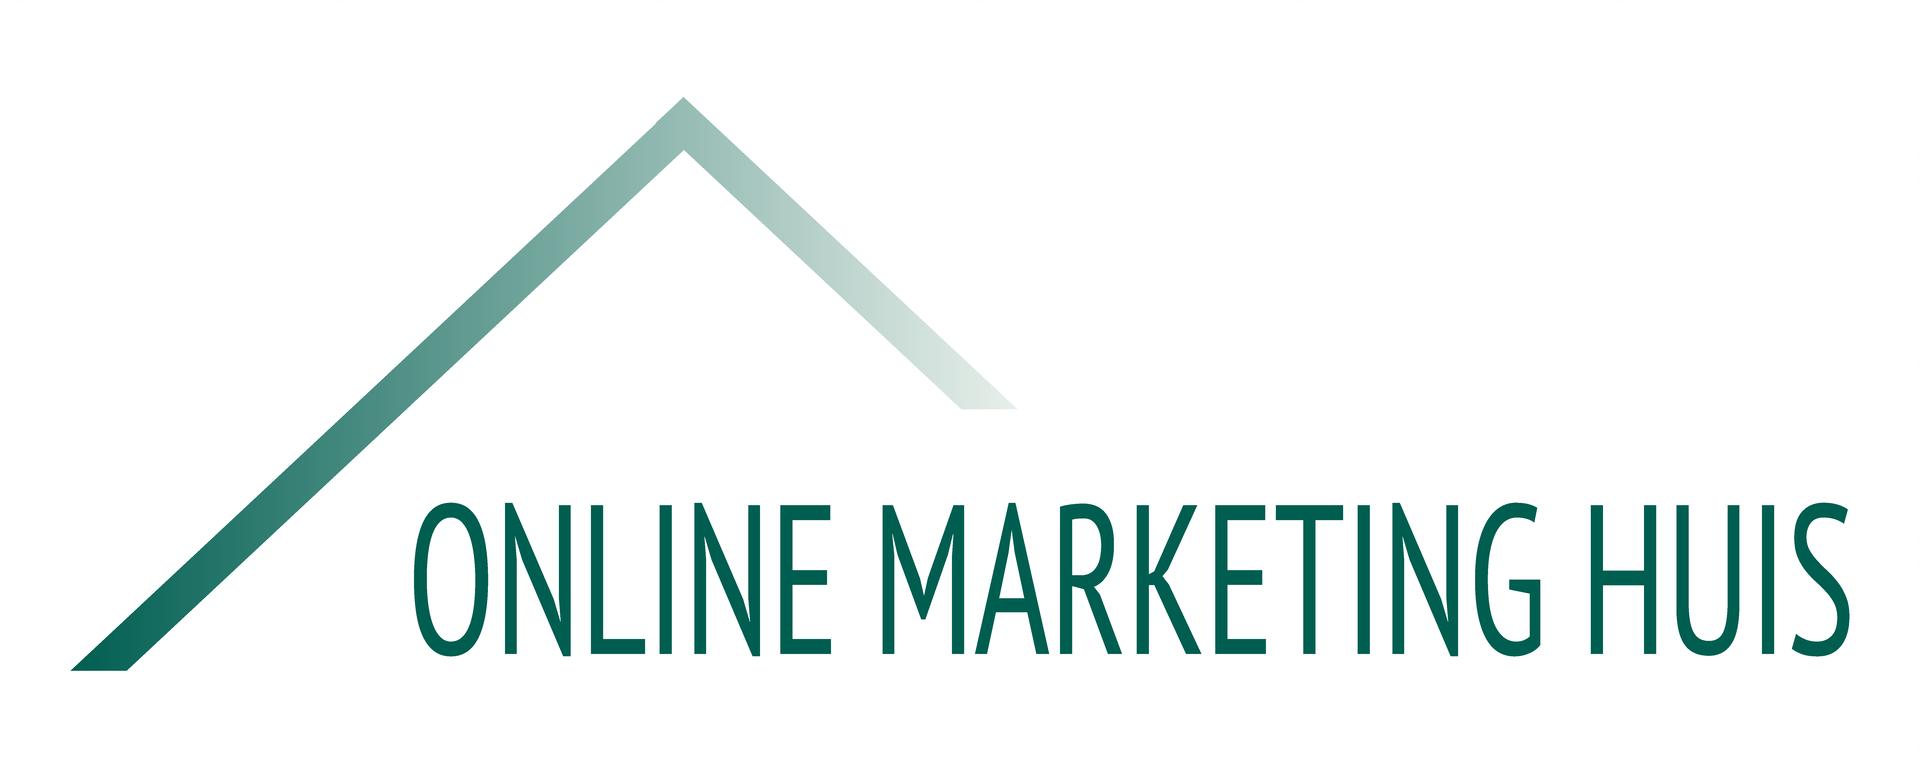 Online marketing huis